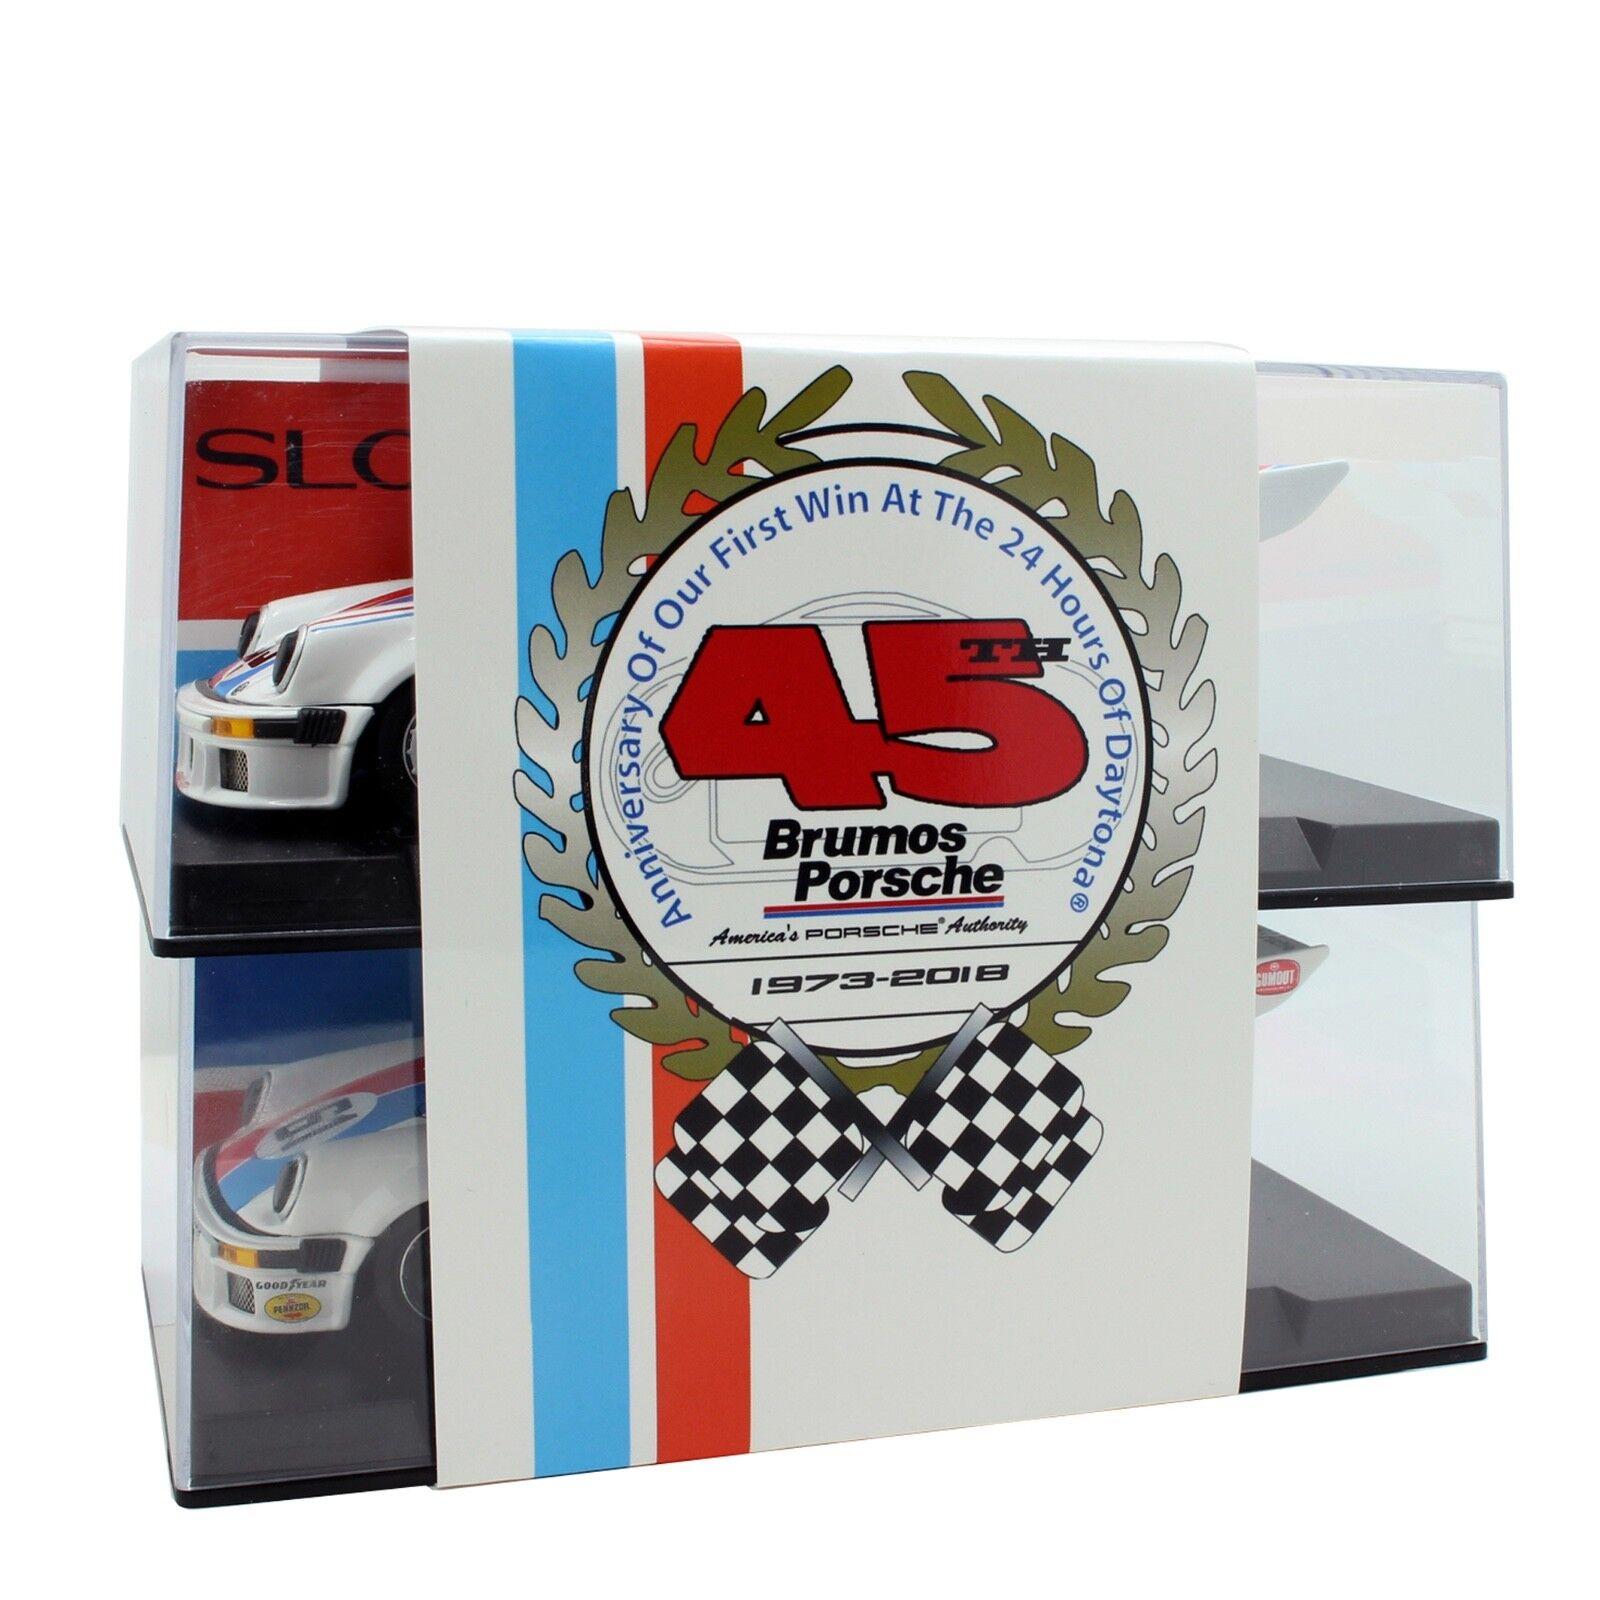 SLOTWINGS SET003 Special Edition Team Set Brumos Porsche 934 5 No.59 No.61 1 32    Berühmter Laden